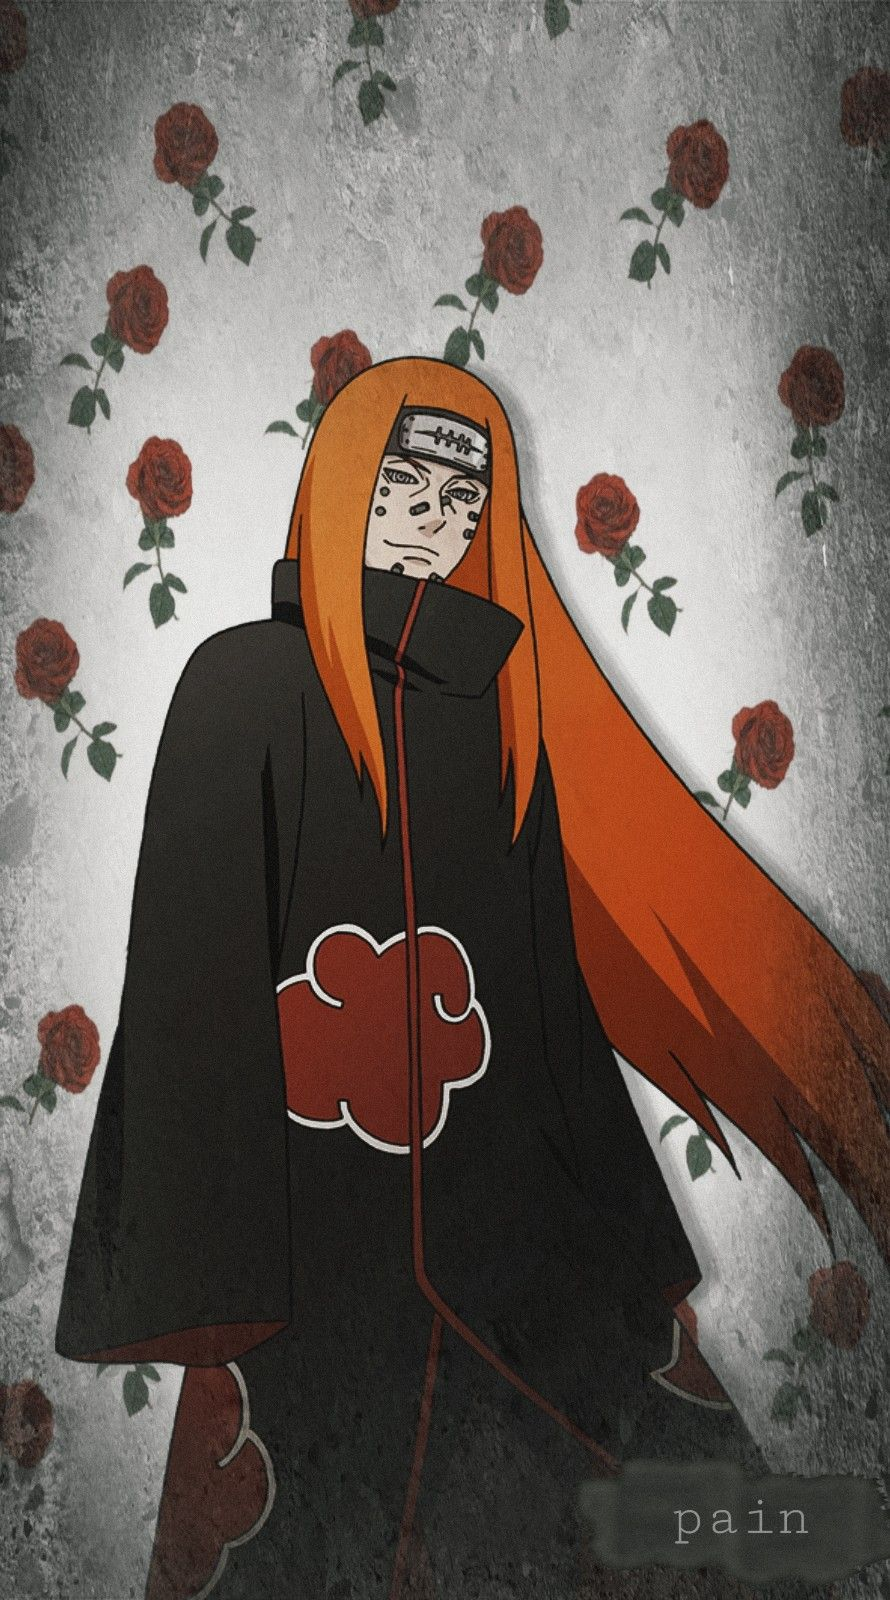 Pain Nagato Naruto Wallpaper Flowers Anime Tumblr